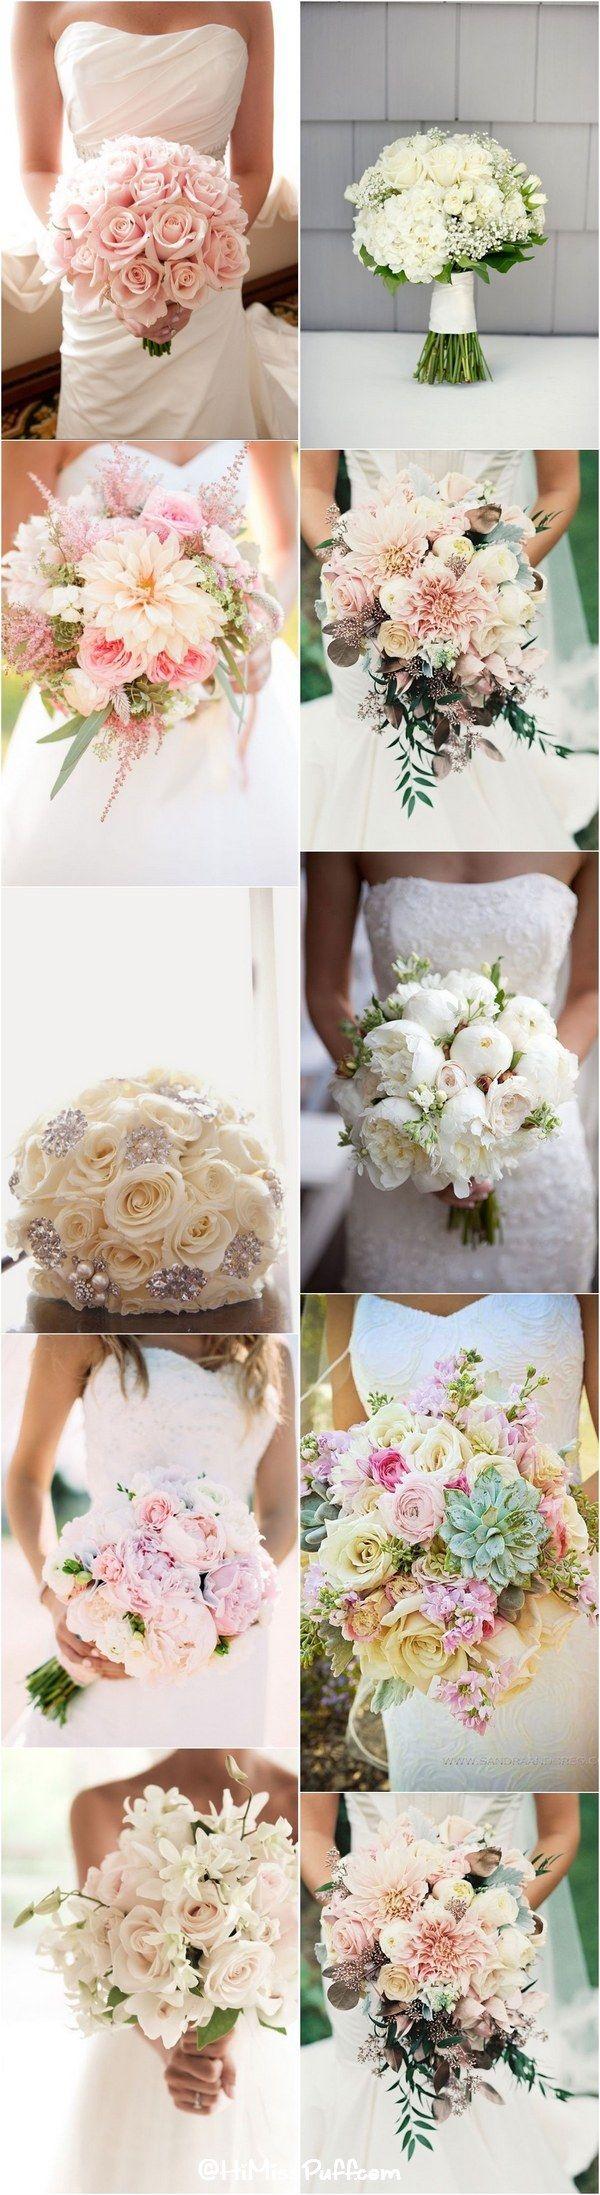 Romantic Spring u Summer Wedding Bouquets Summer wedding